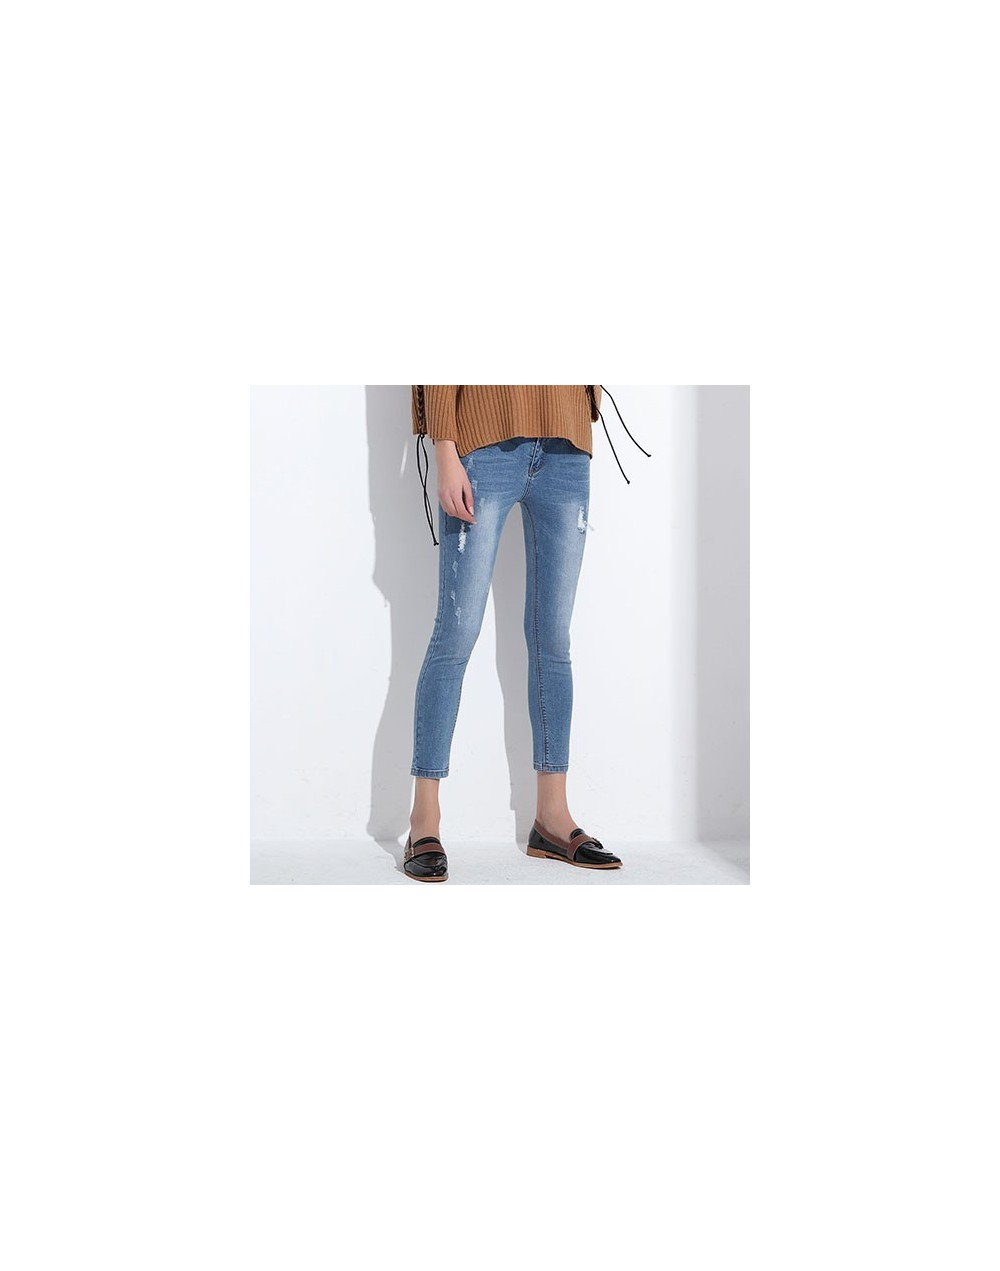 Ripped Jeans For Women Skinny Denim Capri Jeans Femme Stretch Female Jeans Vaqueros Mujer Slim Pencil Pants For Women GAREMA...